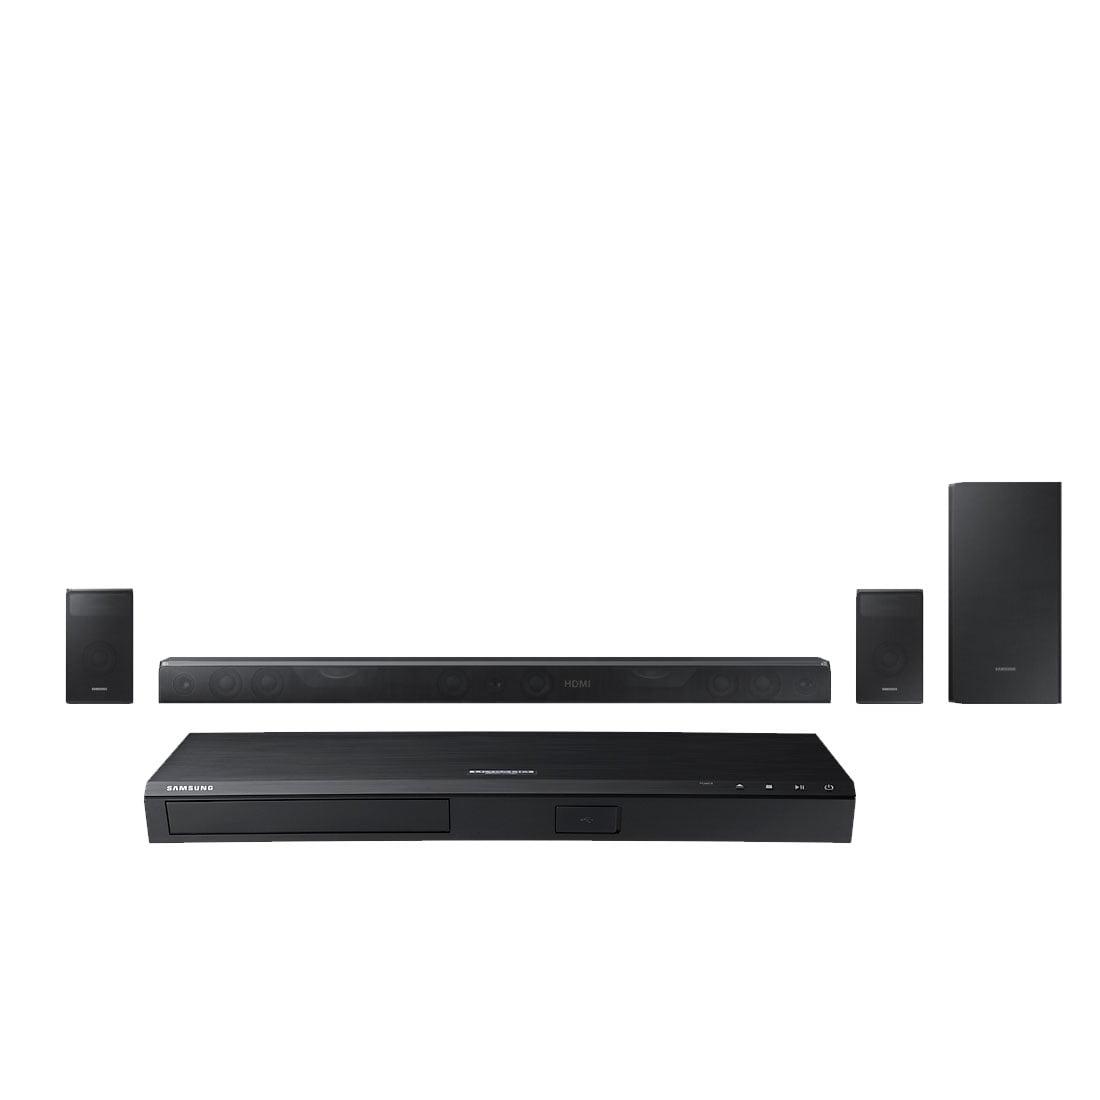 Hw K950 5 1 4 500w Soundbar With Dolby Atmos And Ubd M8500 Zc  # Meuble Tv Samsung